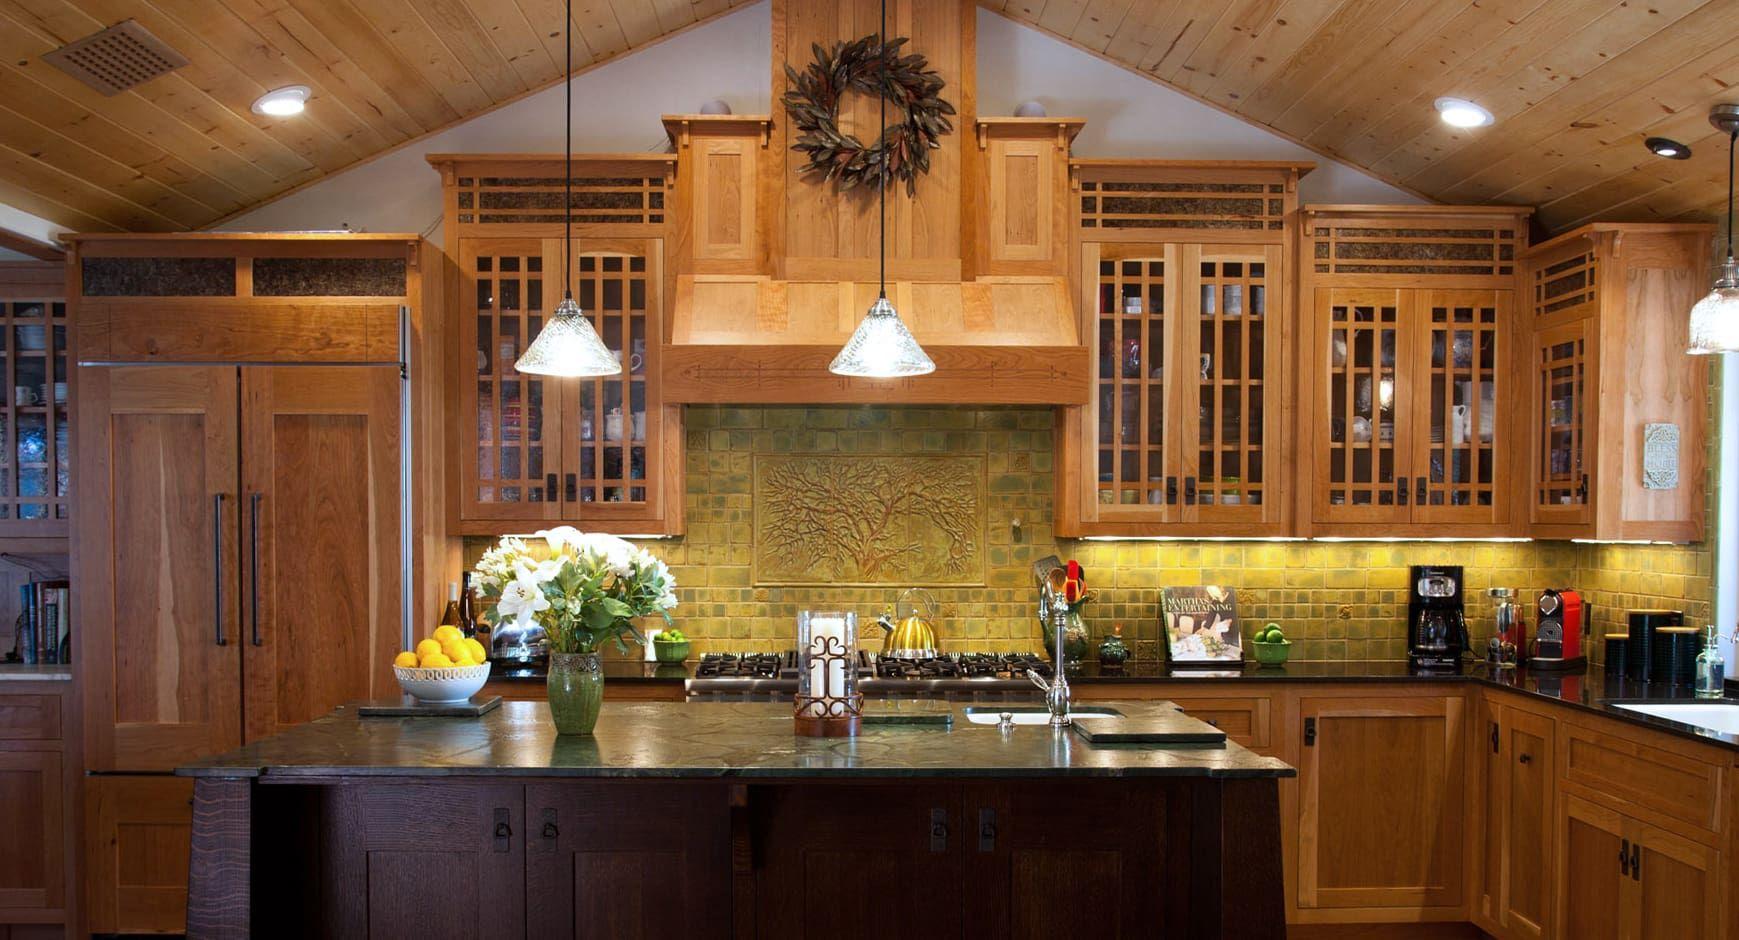 Hile Kitchen By Pasadena Craftsman Tile At Private Residence Pasadena Ca Craftsman Kitchen Kitchen Cabinet Styles Kitchen Craft Cabinets